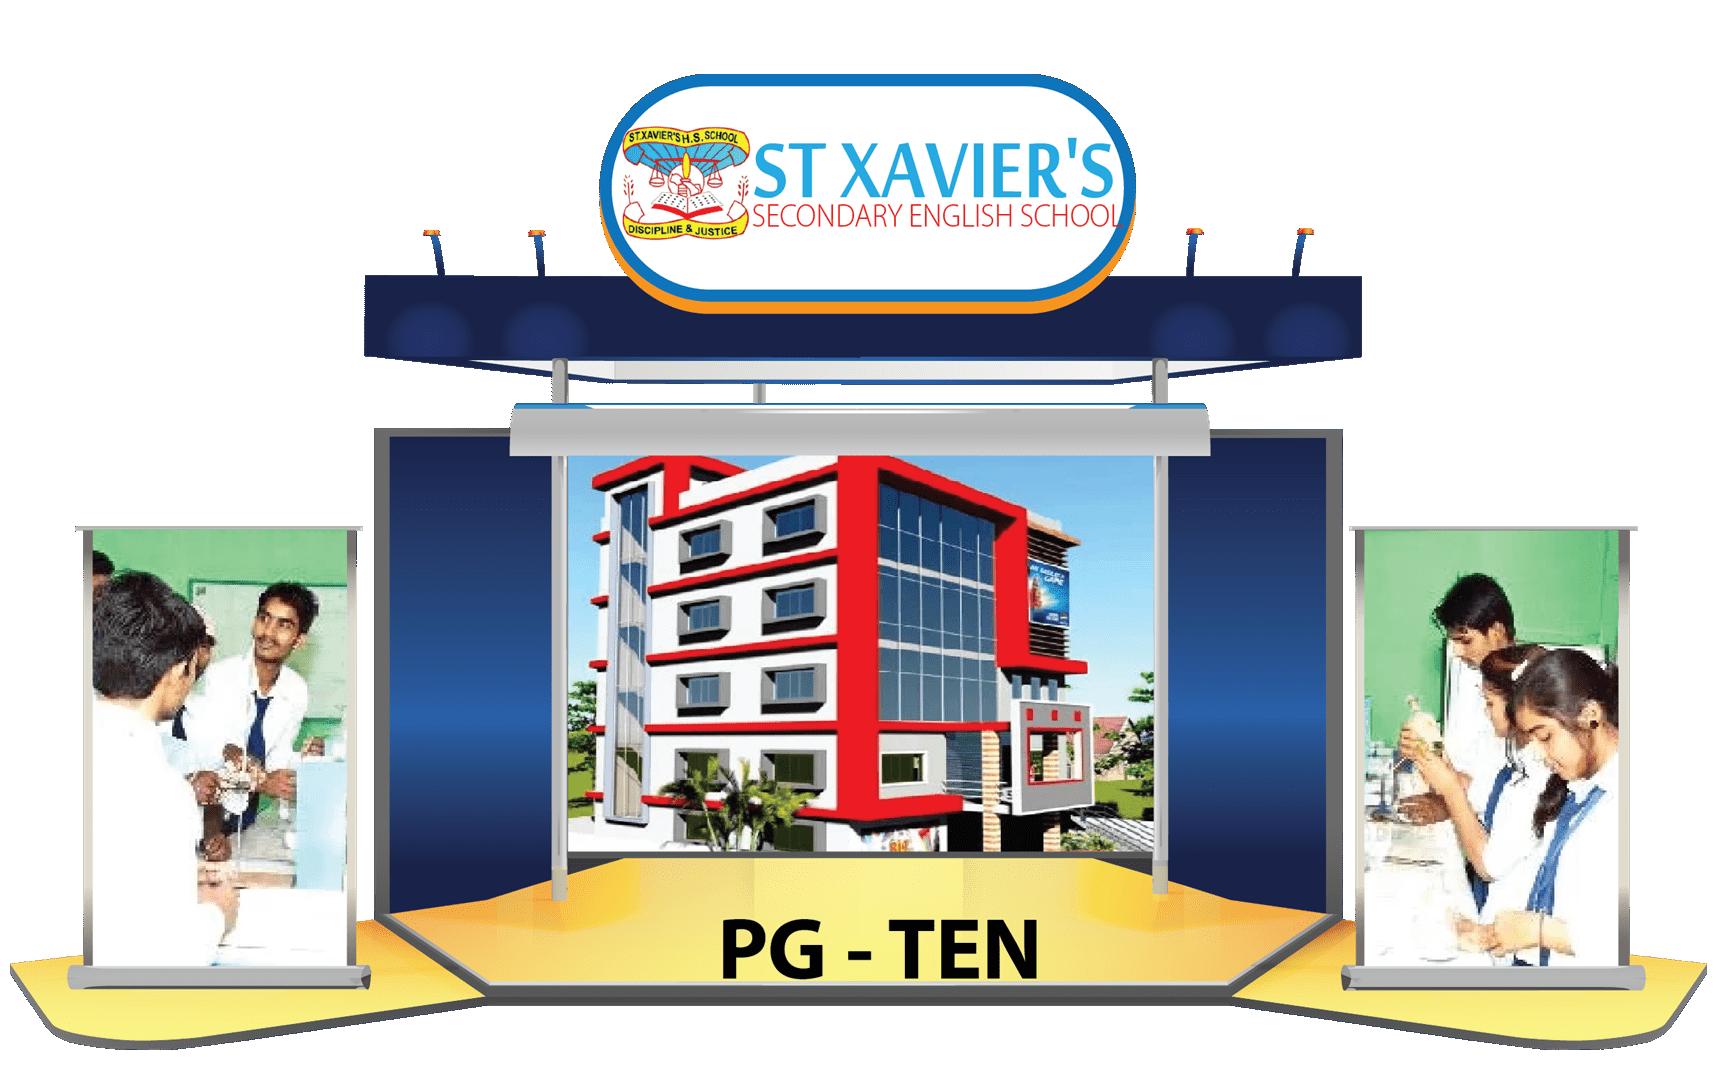 St Xavier's Secondary  English  School